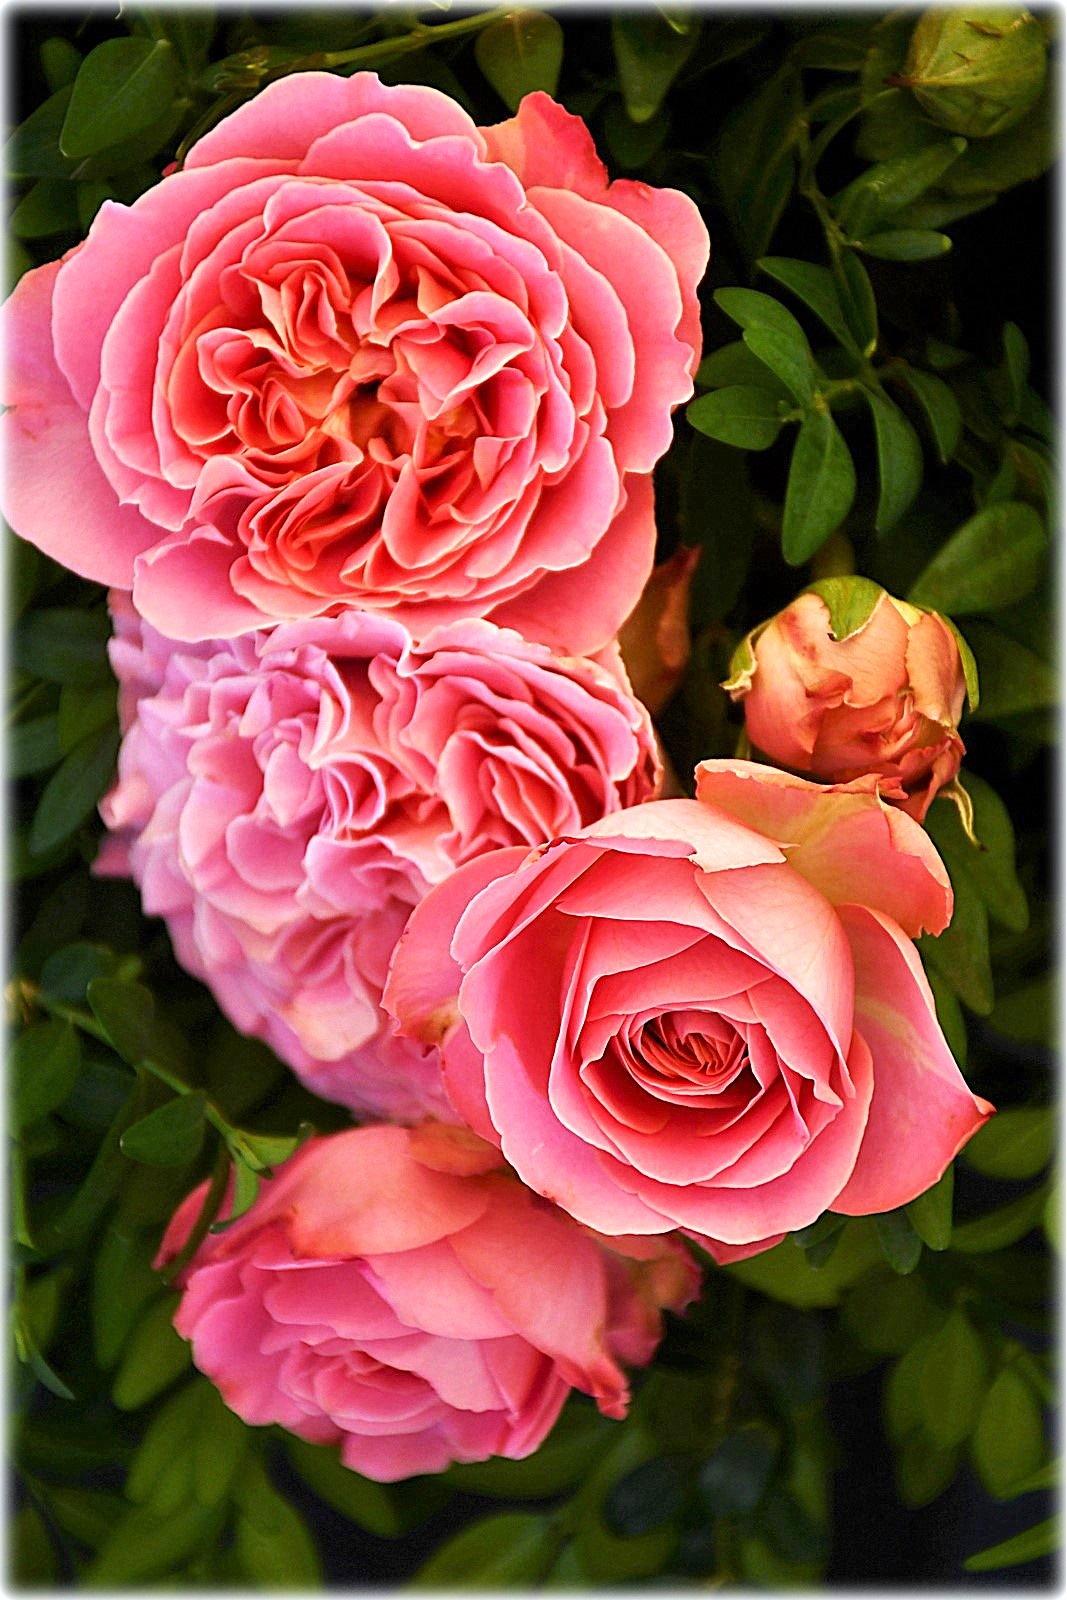 """roses"" by BauerStefan"